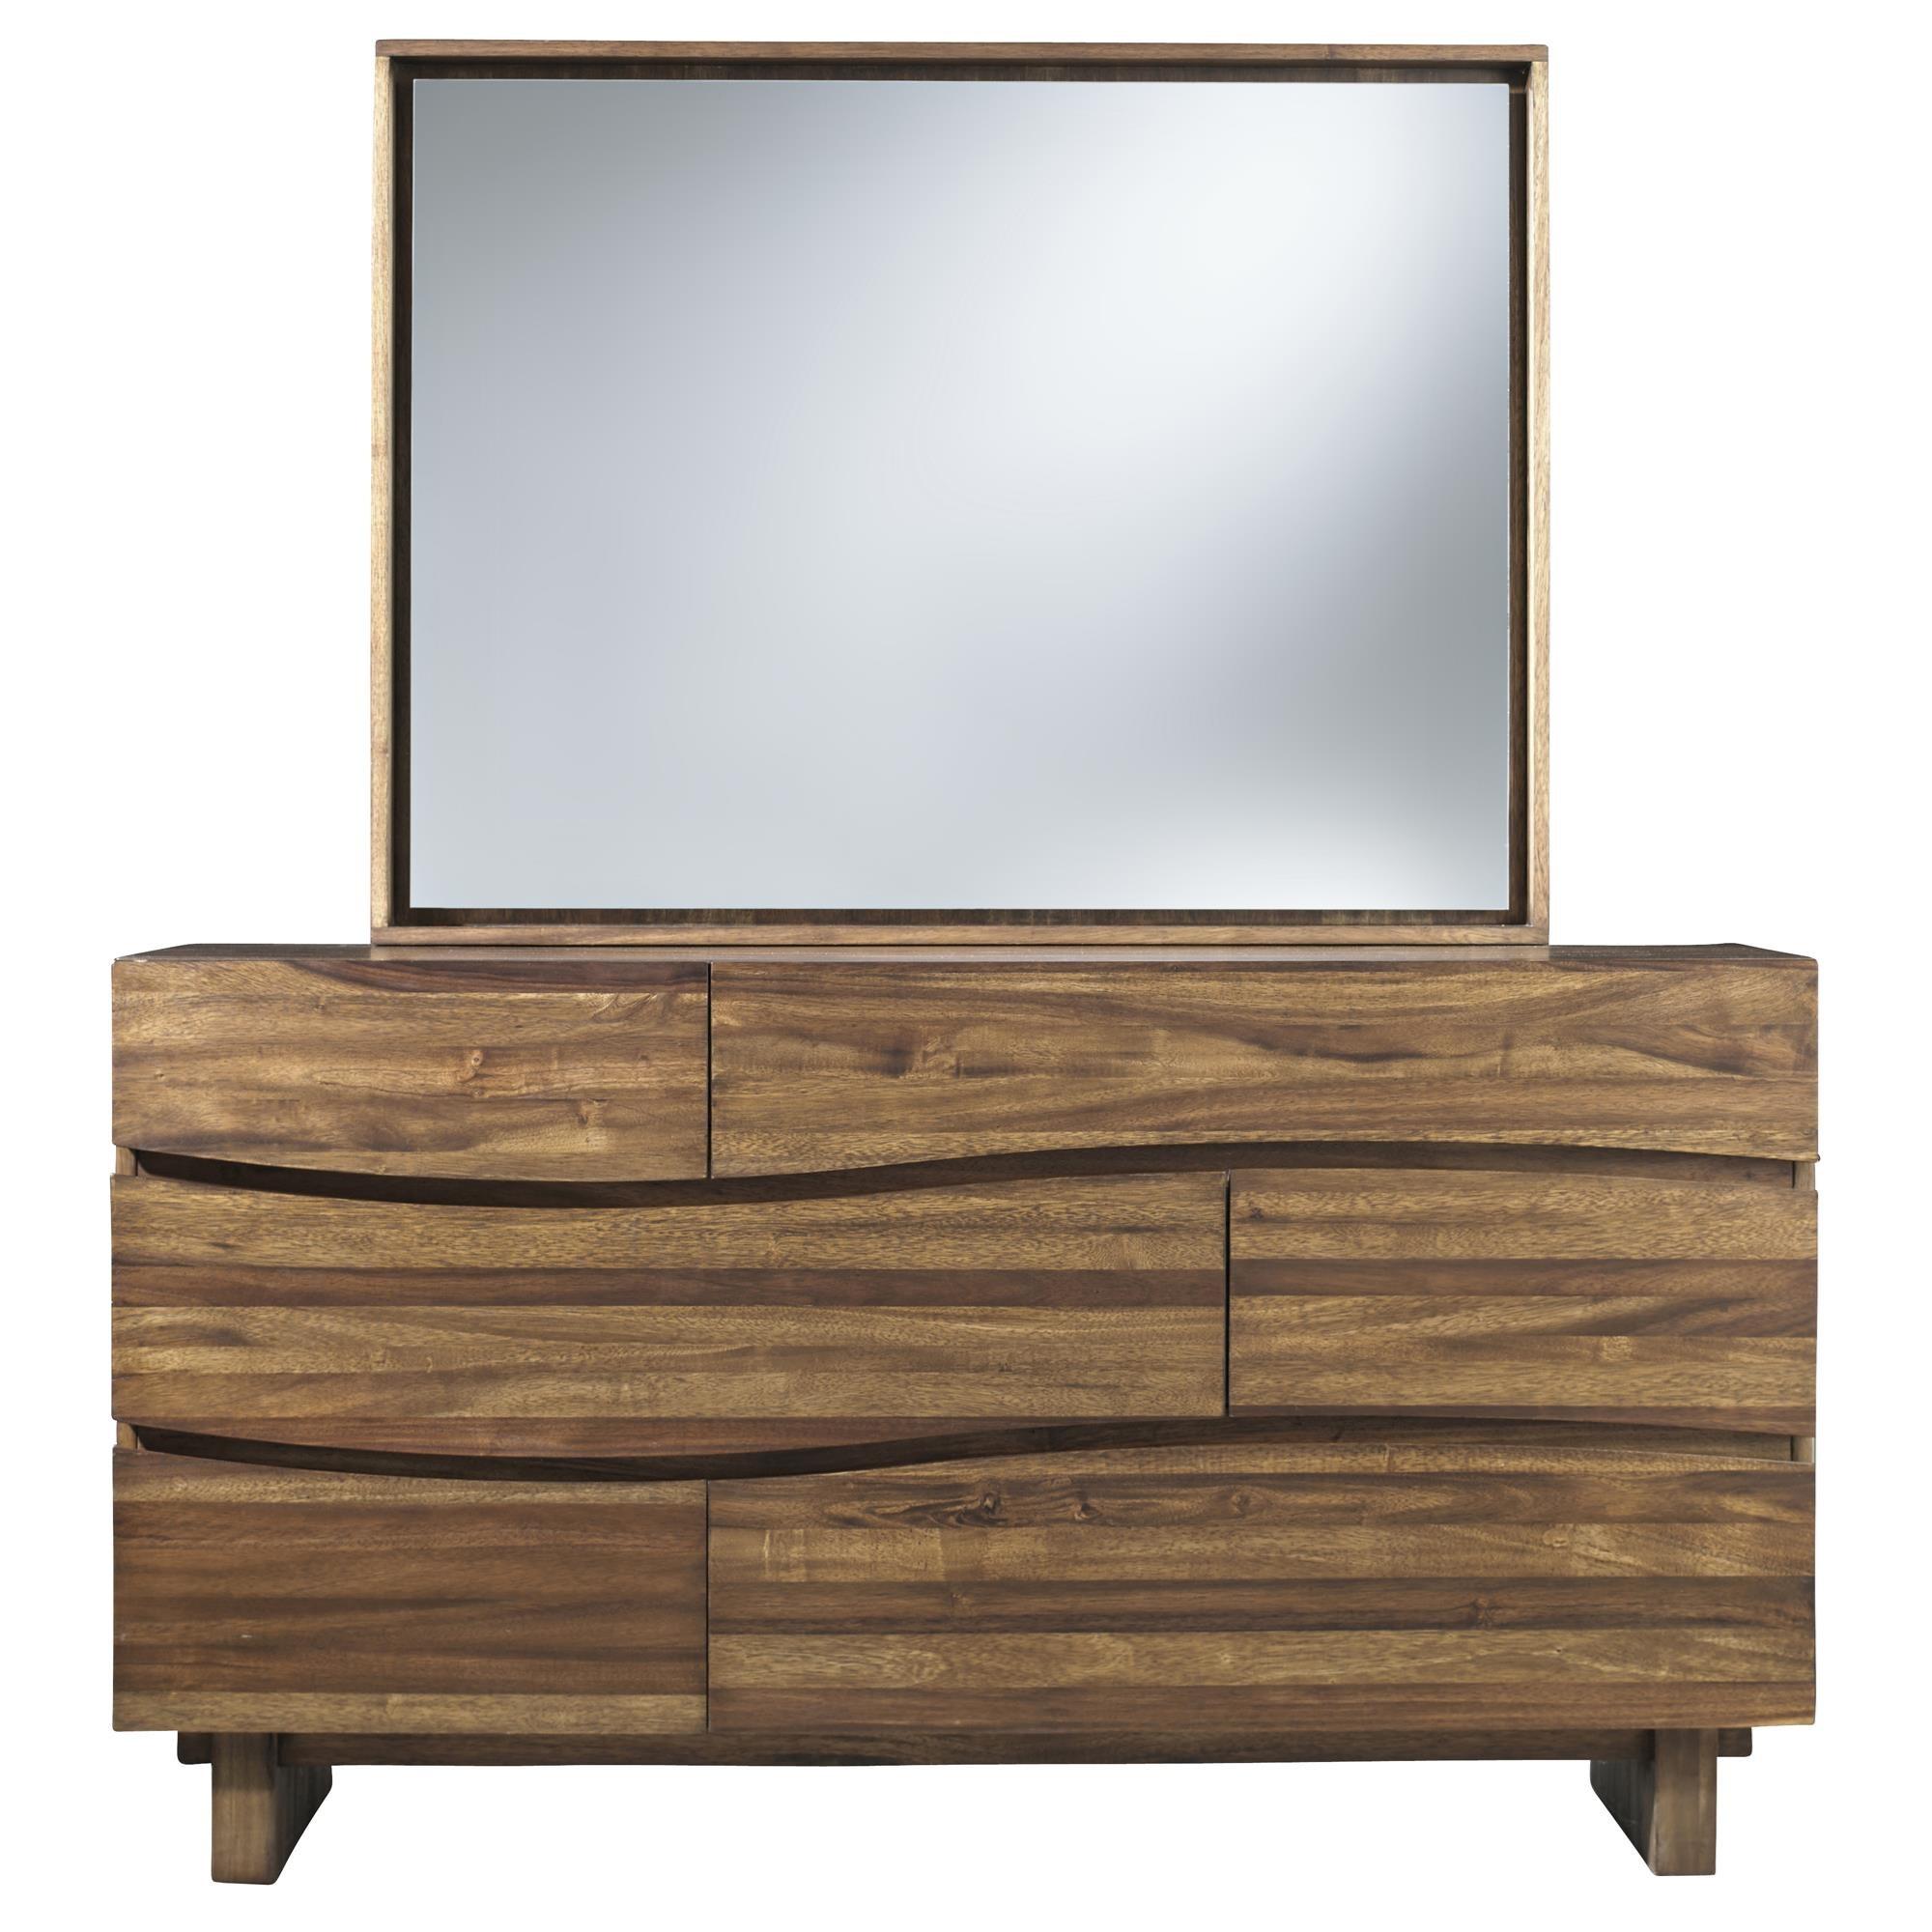 Ocean 6 Drawer Dresser by Modus International at HomeWorld Furniture